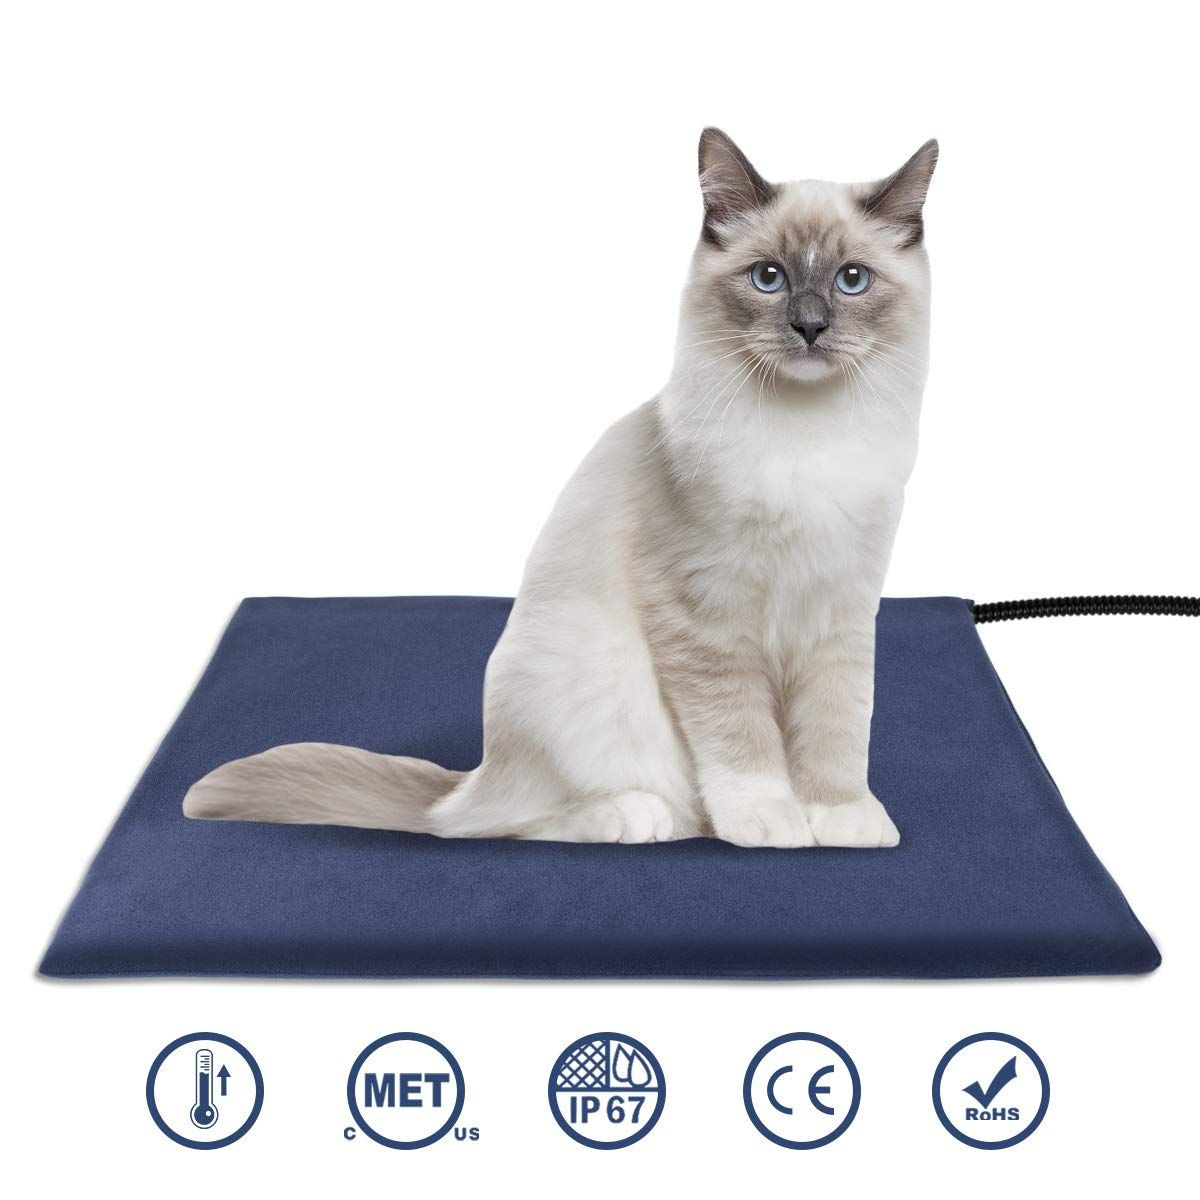 Cat Is A Loving Pet Pet Heating Pad Cat Pet Supplies Heated Pet Beds